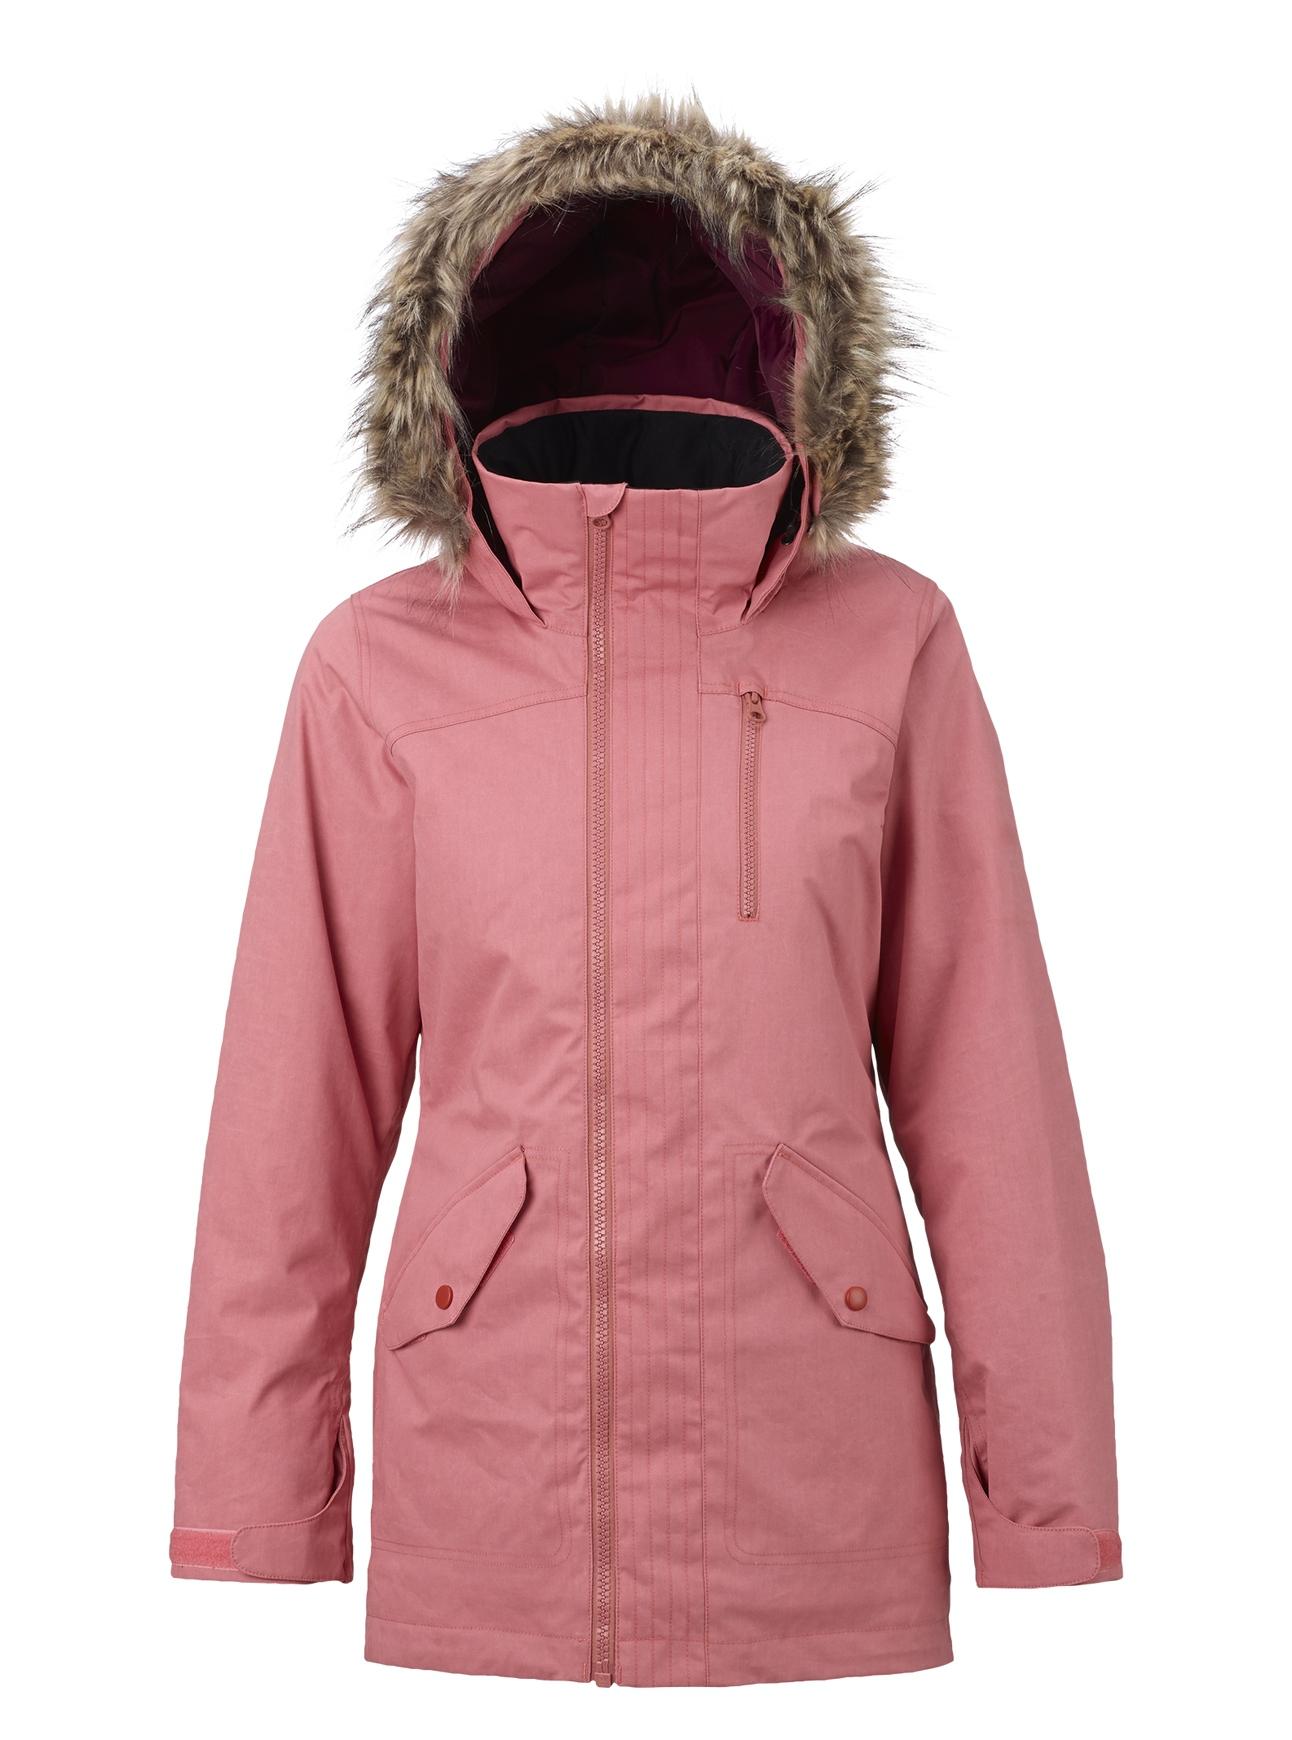 Burton Wax Wb Vestes Dusty Jacket Ski Hazel Rose Snowleader FIqwX6q